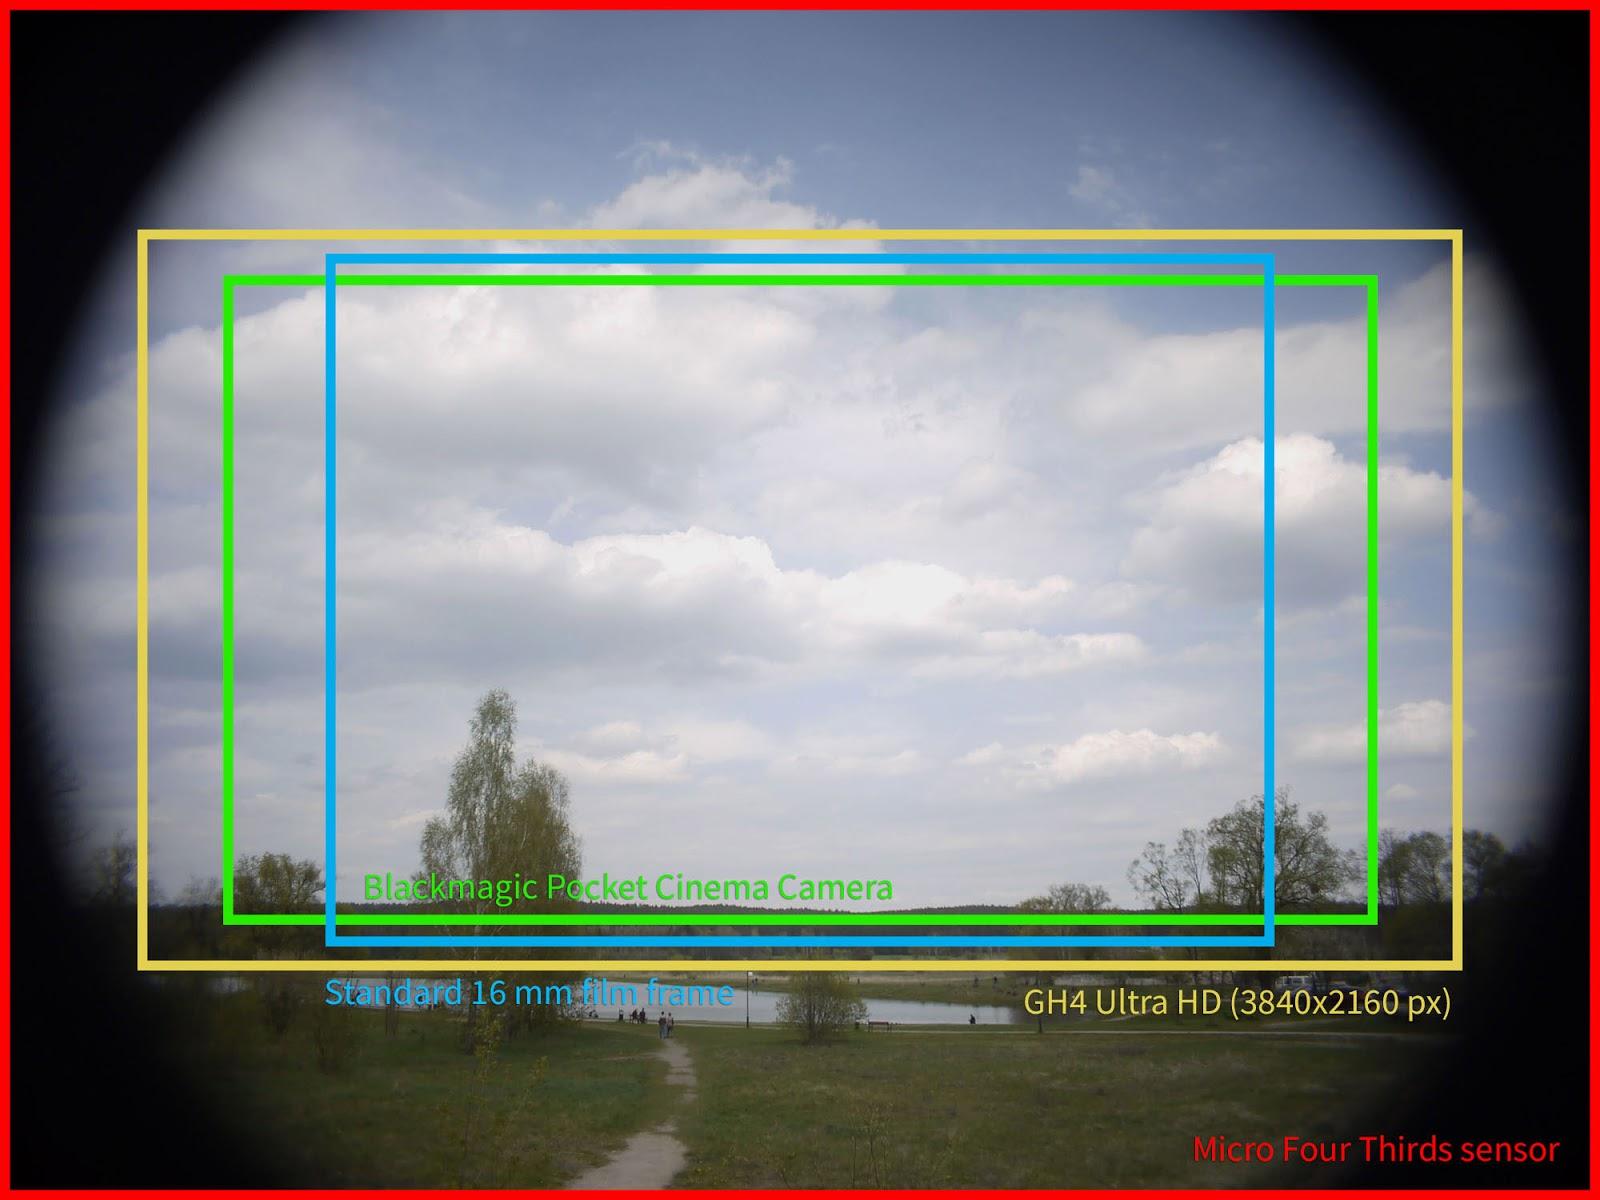 Cosmicar 12.5/1.9 @1.9 - MFT, BMPCC, GH4 UltraHD sensor coverage